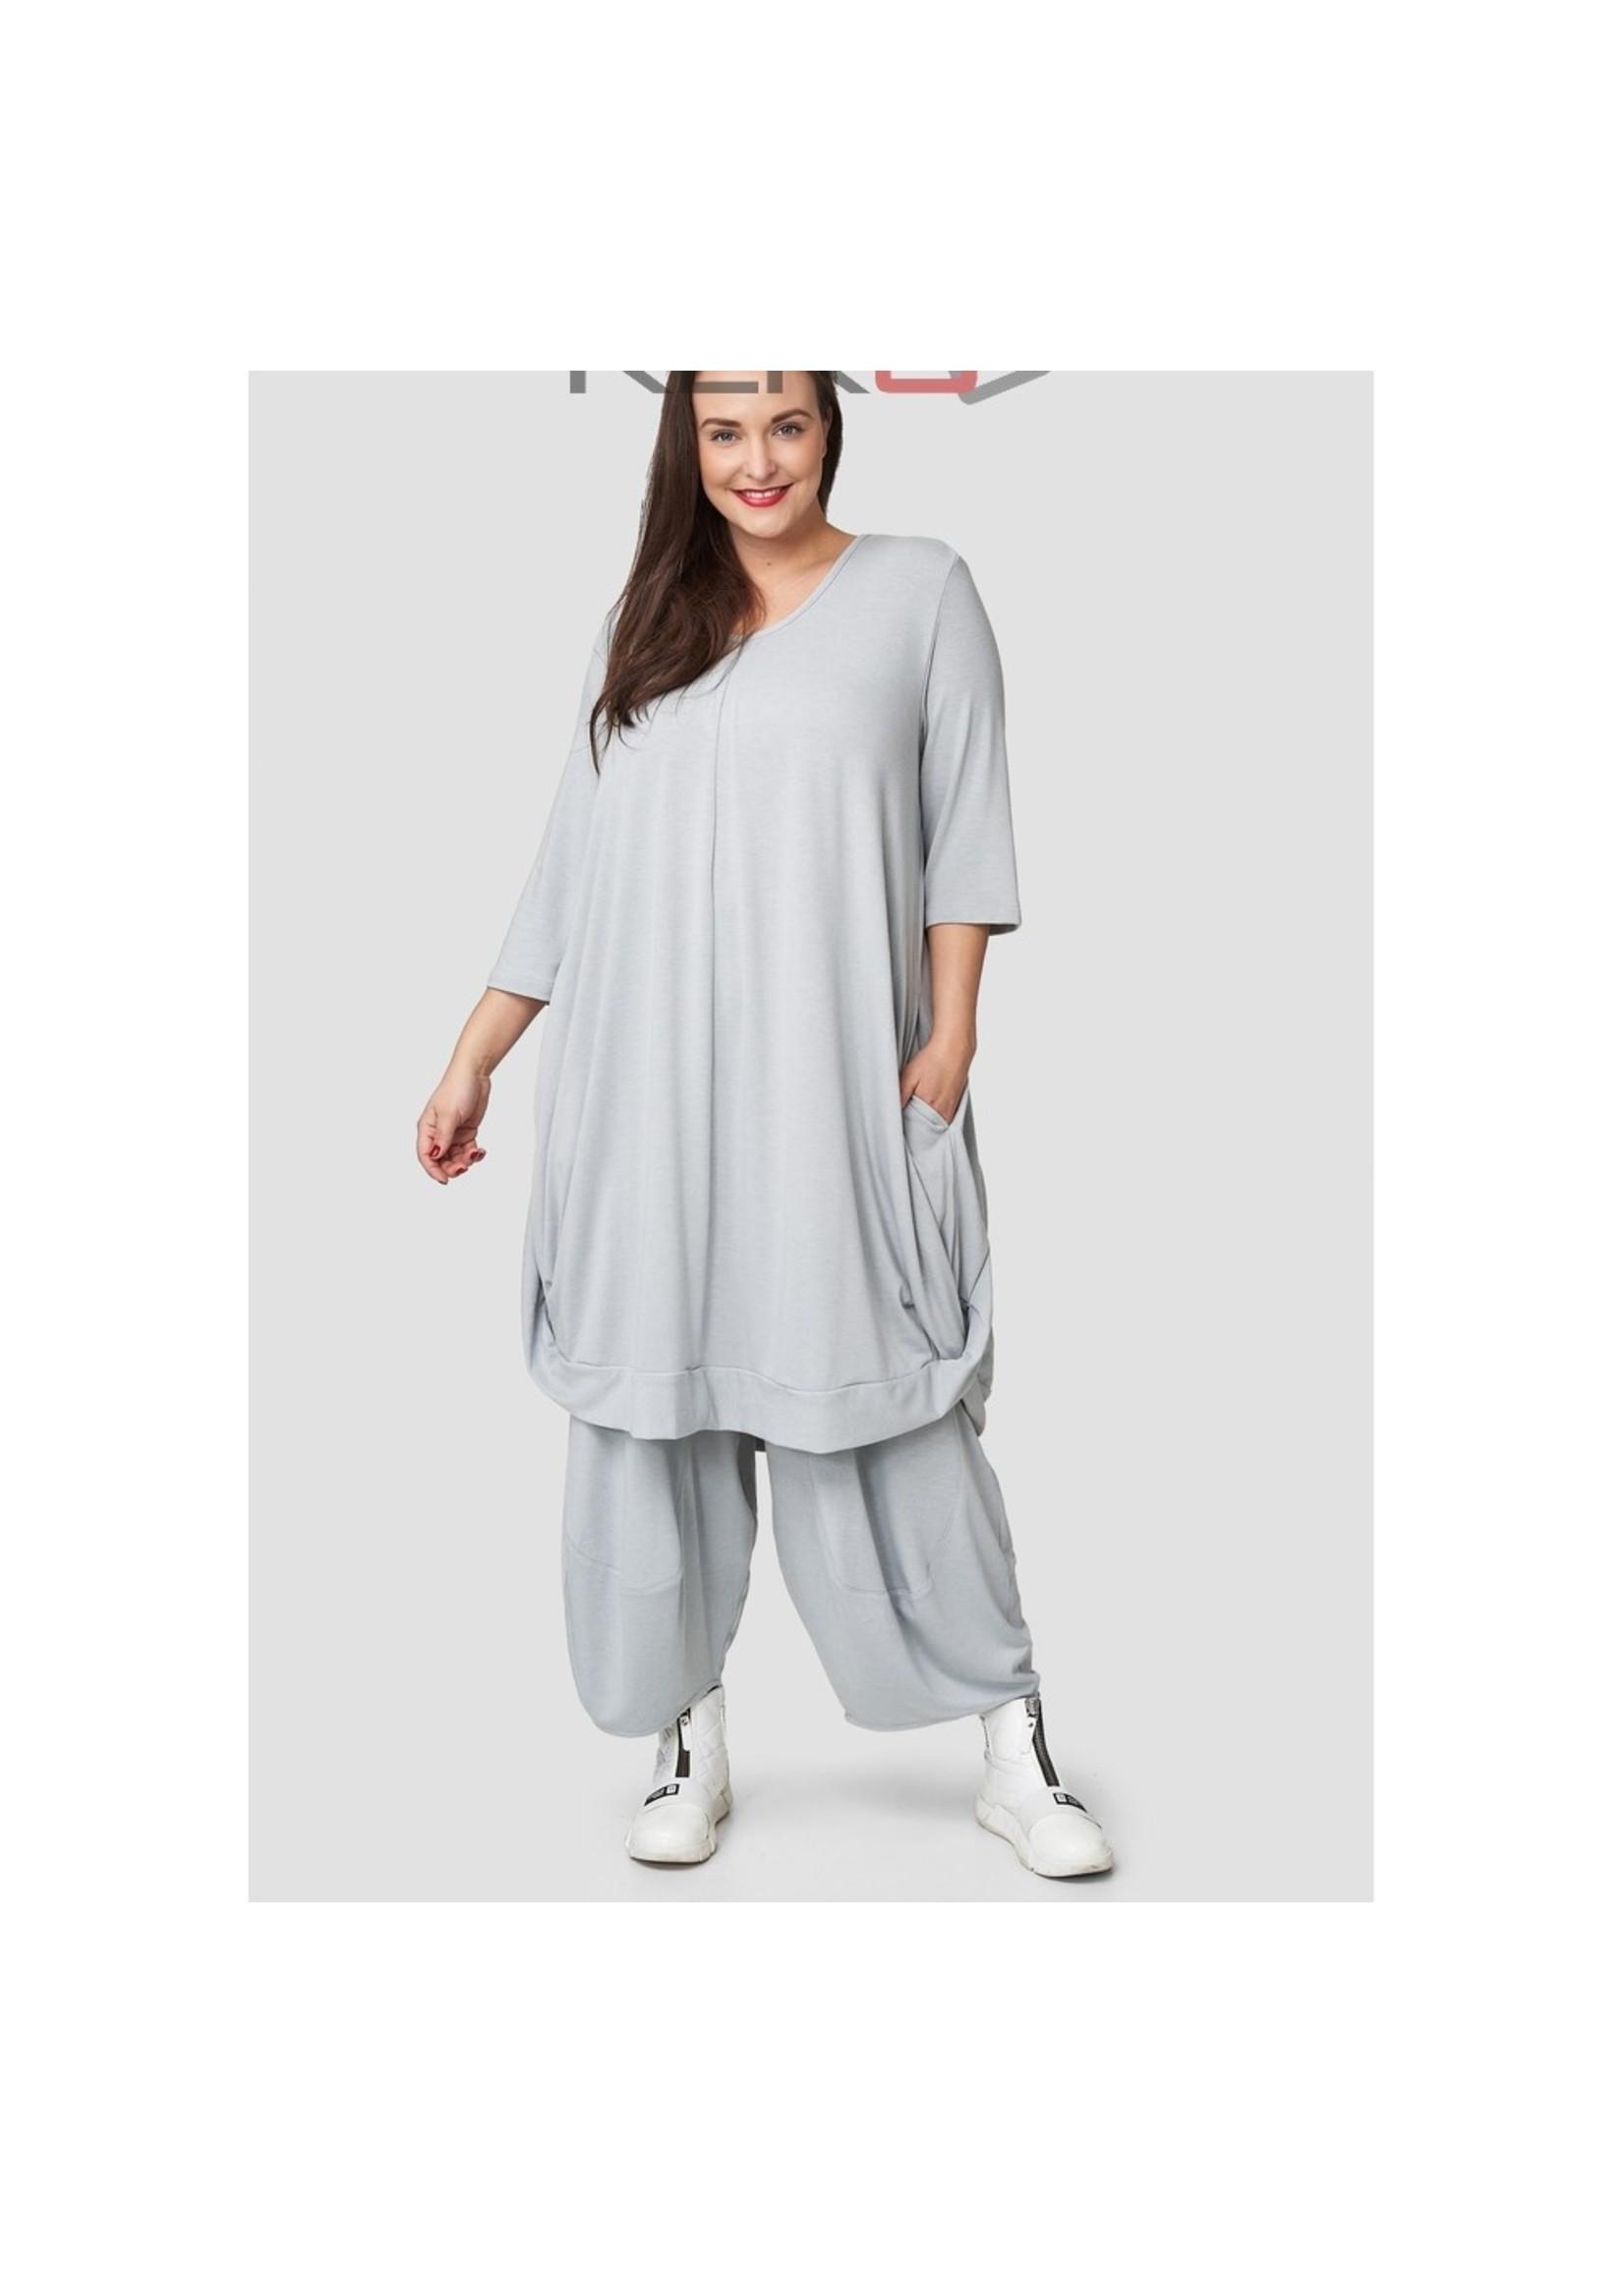 KEKOO 1209236 dress